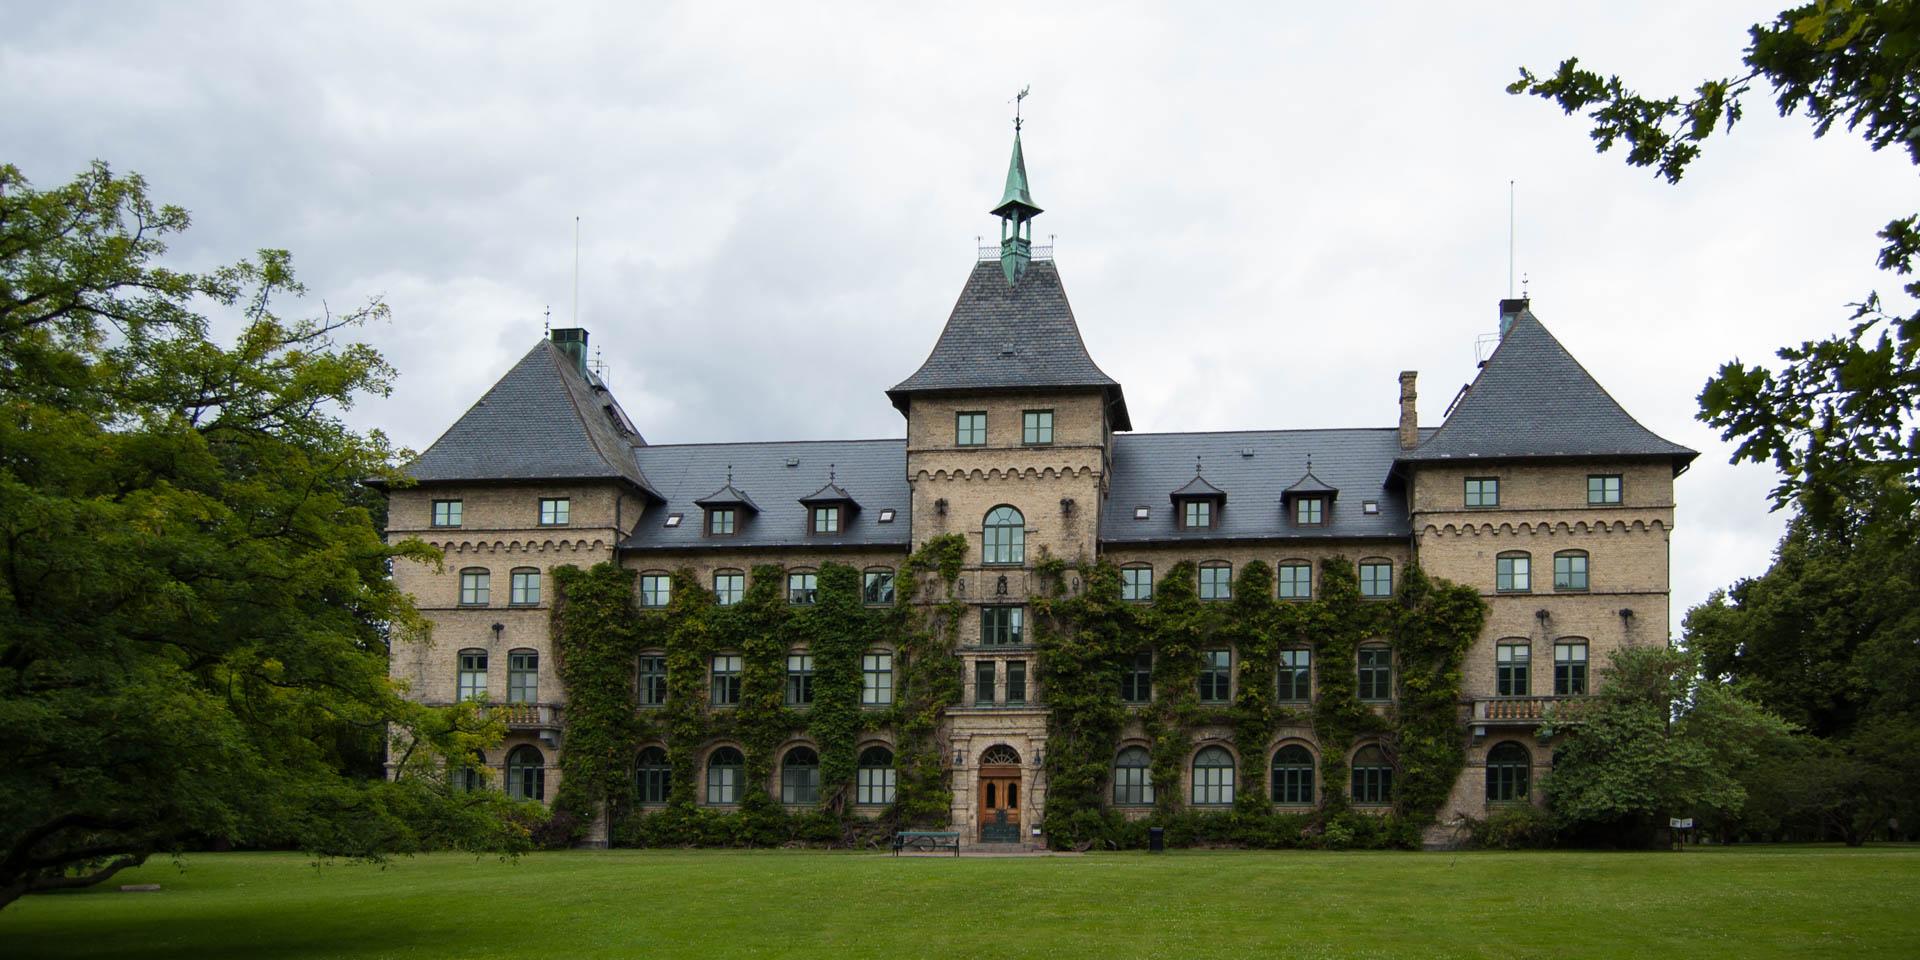 Alnarps Slott & Alnarpsparken 2015